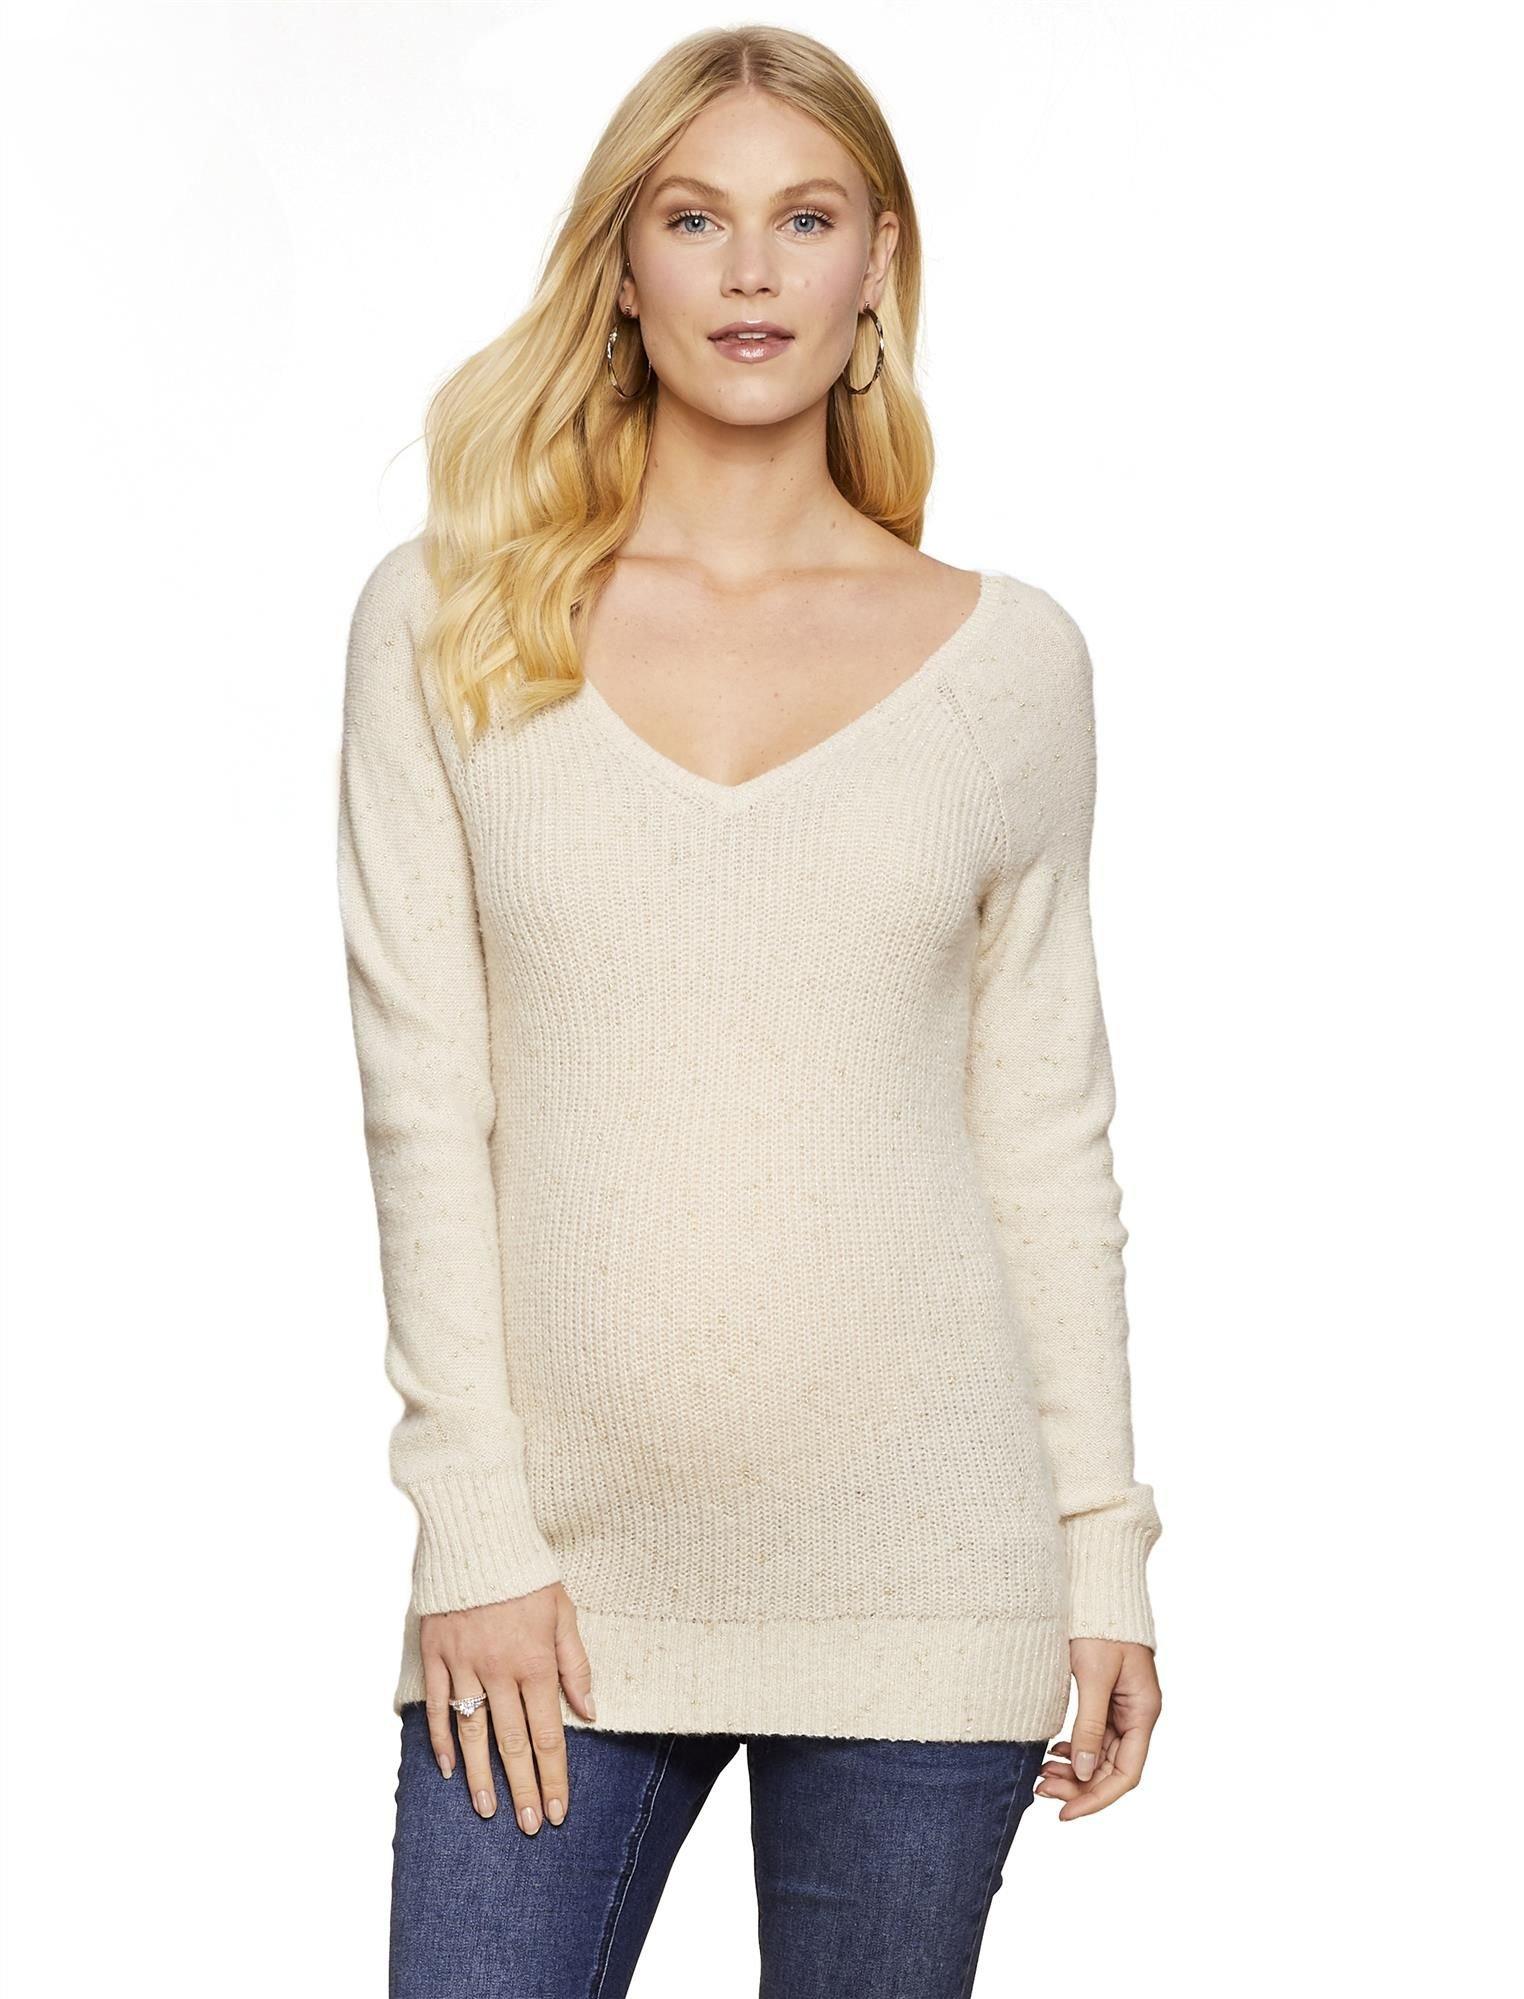 Jessica Simpson Lurex Stitching Maternity Sweater